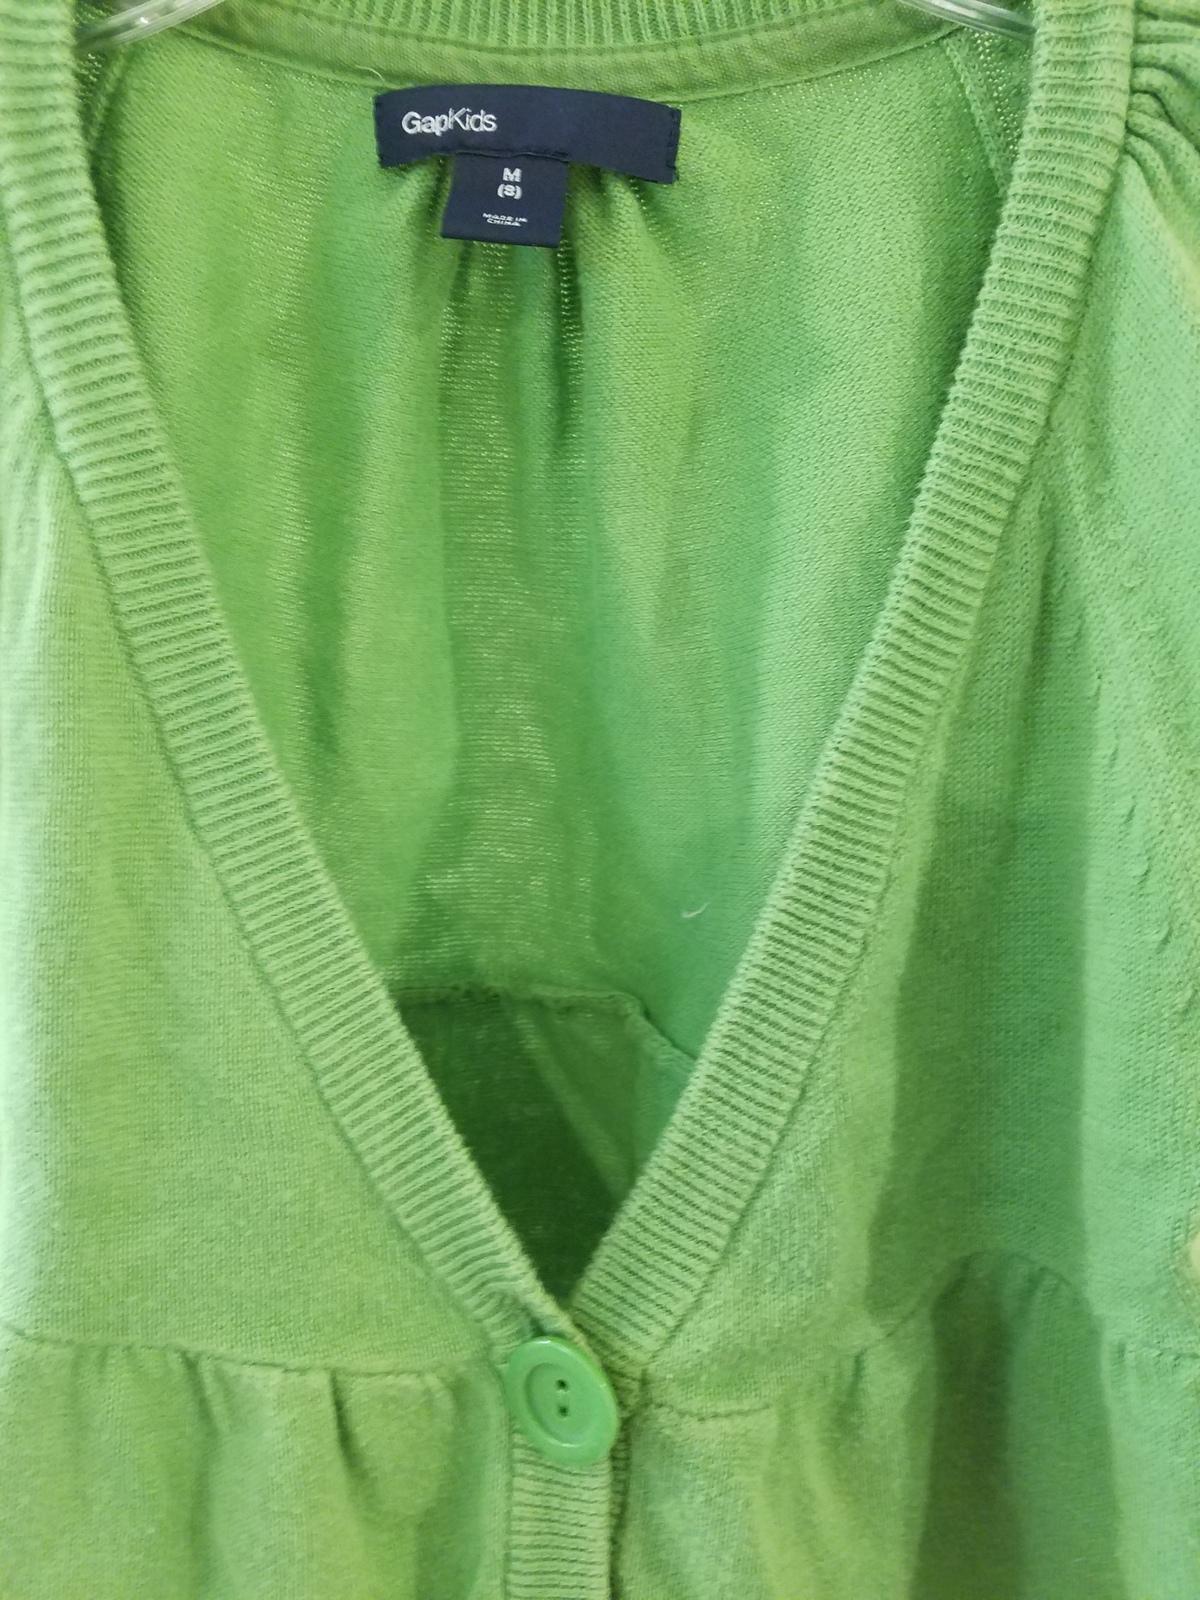 Gap Brand Girls Kids Children Top Sweater Cardigan Size 8 Green Short Sleeves